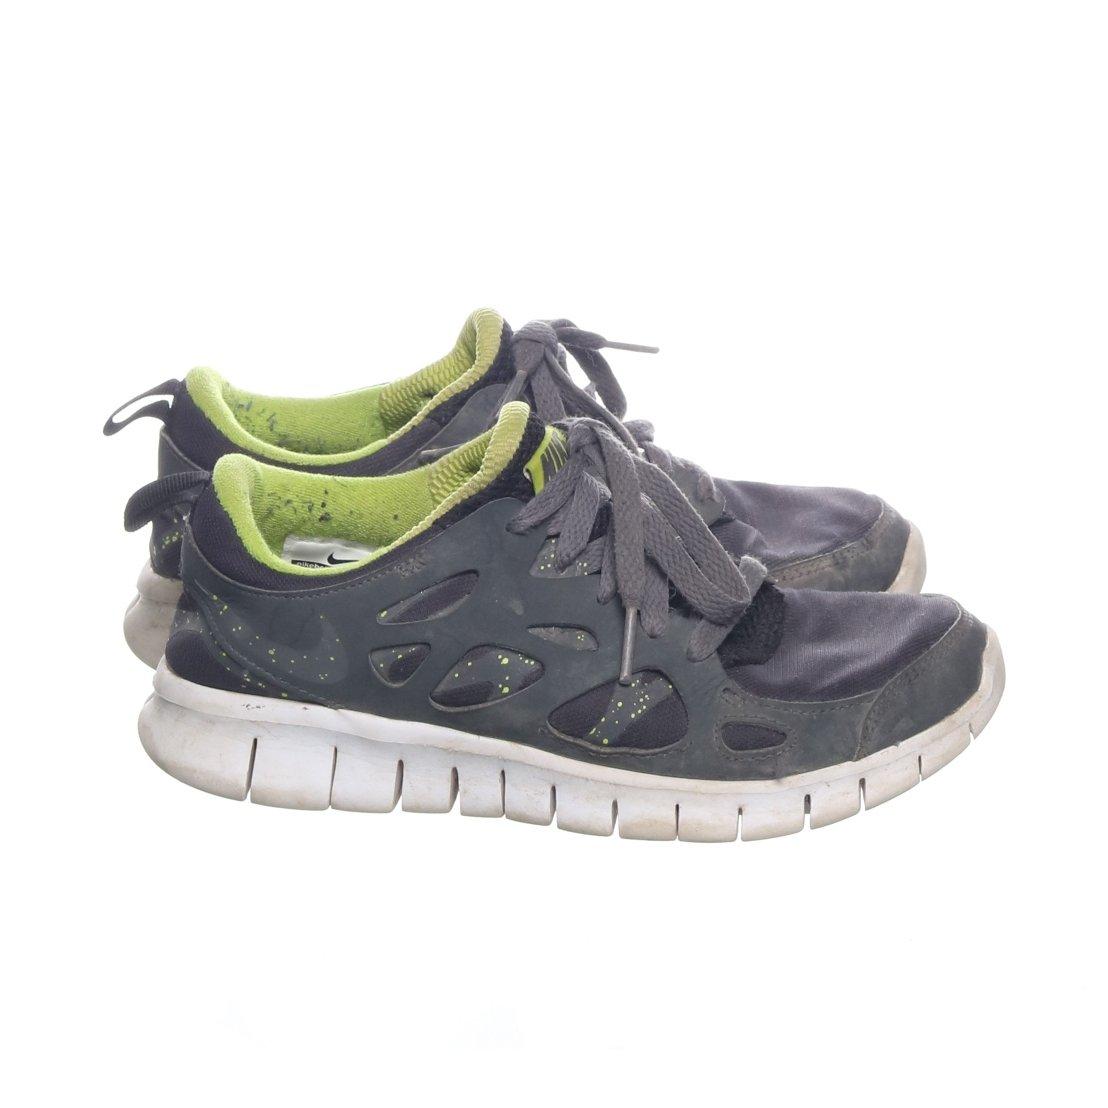 Nike, Träningsskor, Strl: 36, Free Run 2,.. (354742599) ᐈ